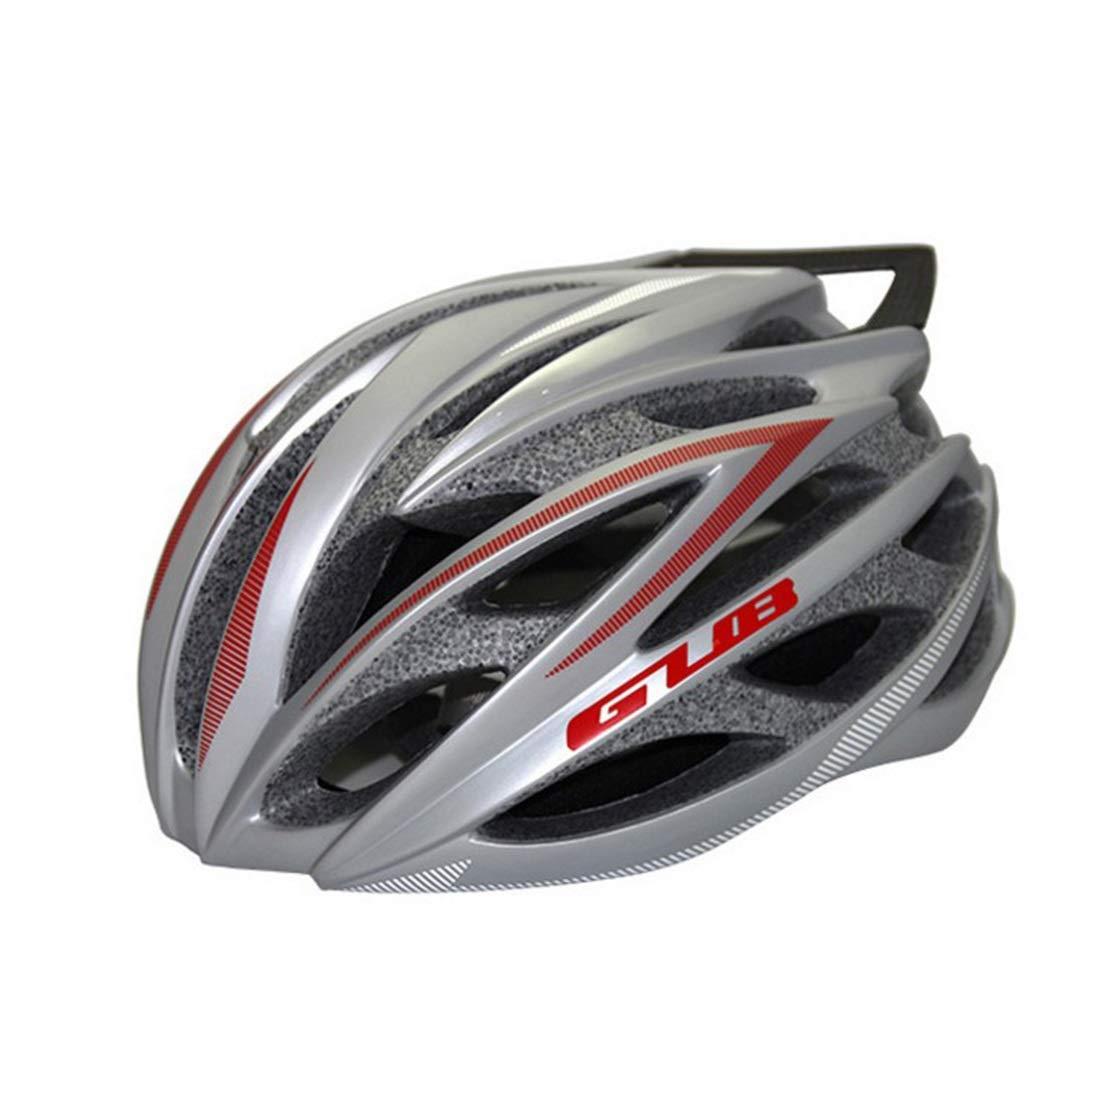 Nekovan 自転車用ヘルメット、屋外用サイクリング愛好家に最適な自転車用安全ヘルメット。 (Color : Silver)  Silver B07QHL3Q3G